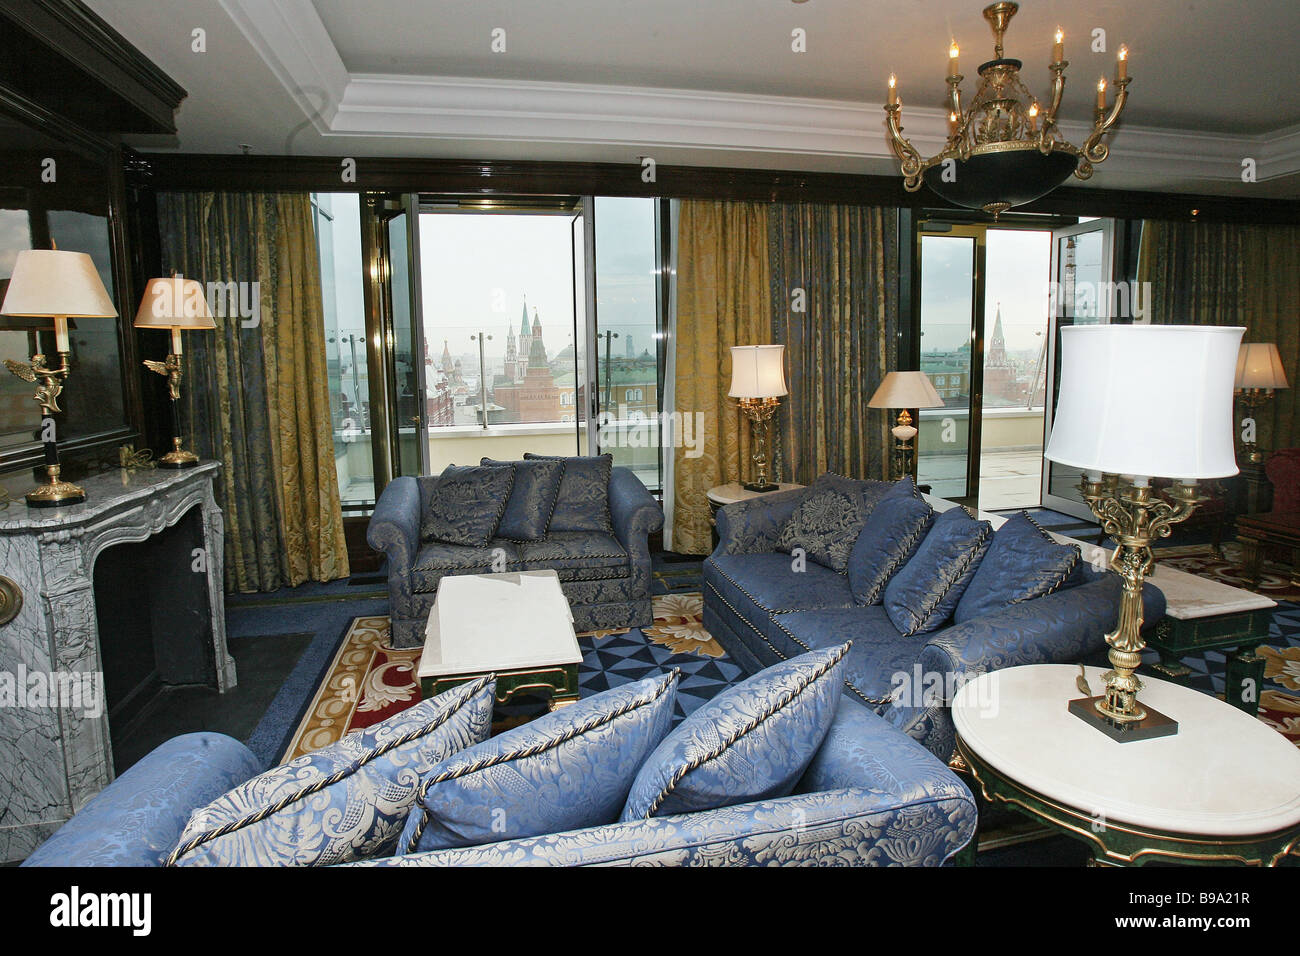 hotel intourist stockfotos hotel intourist bilder alamy. Black Bedroom Furniture Sets. Home Design Ideas